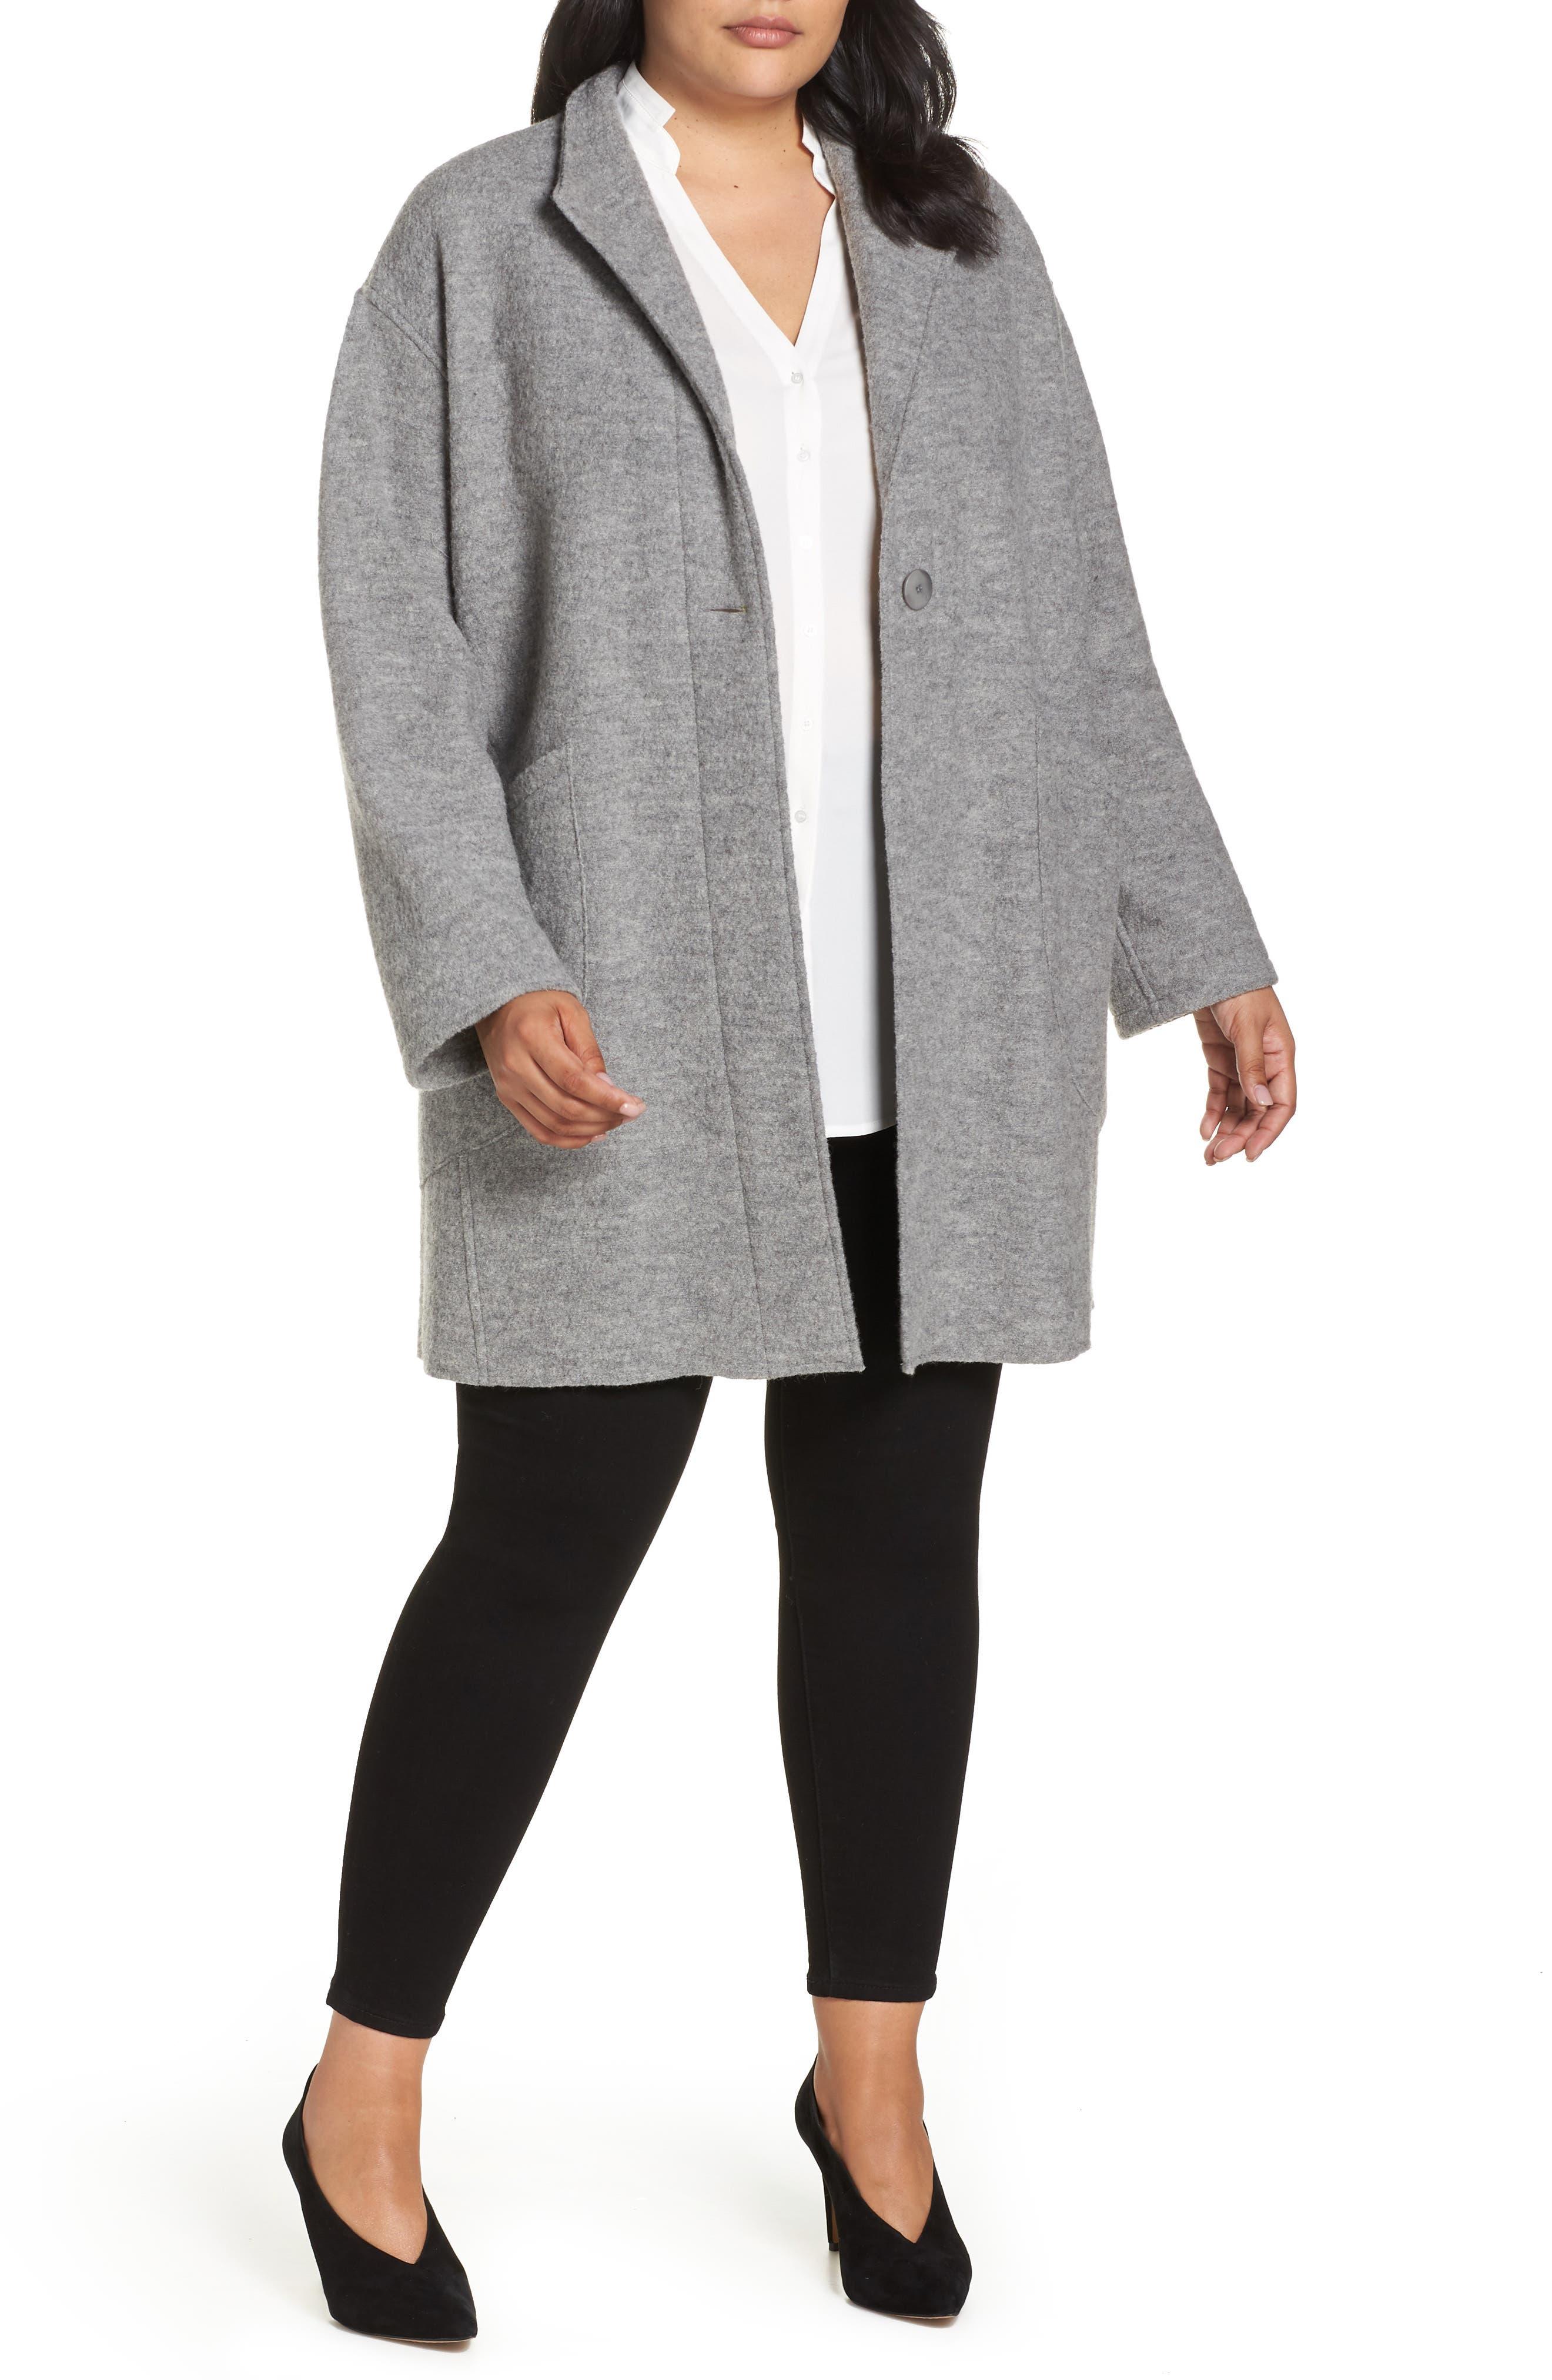 FLEURETTE Teddy Wool Coat, Main, color, 020